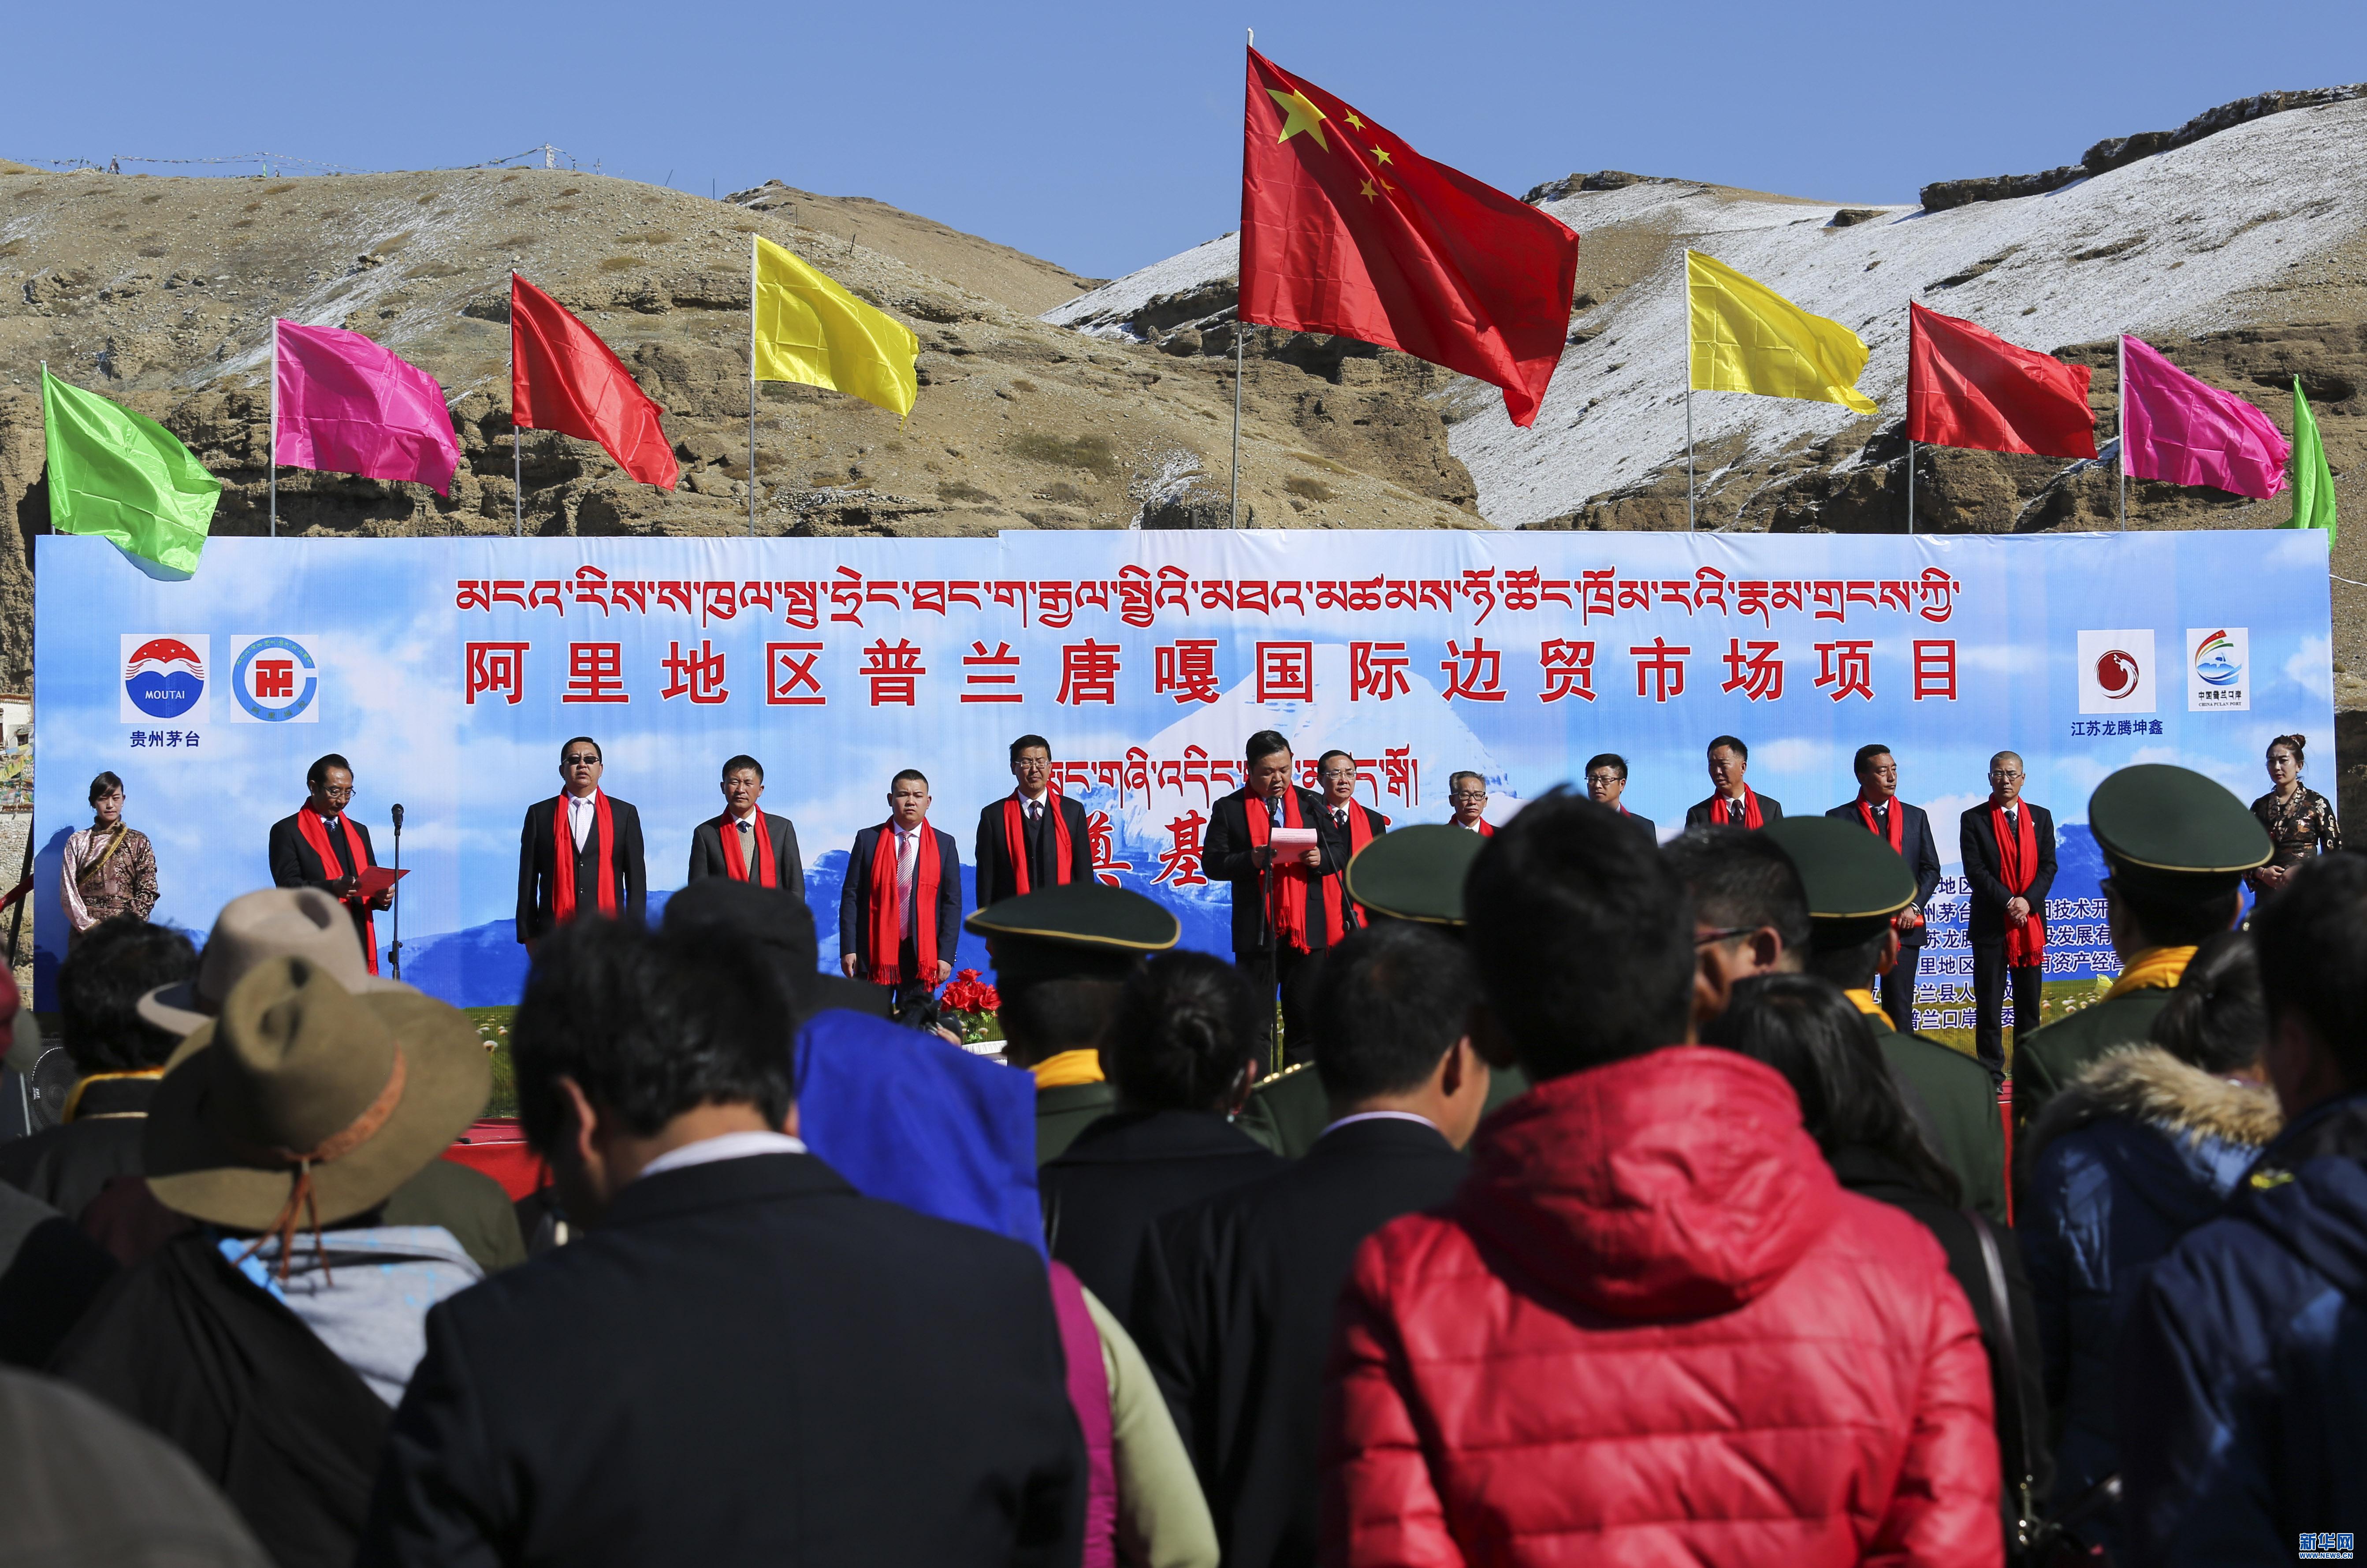 Thangka international trade market begins construction in Nagri, Tibet